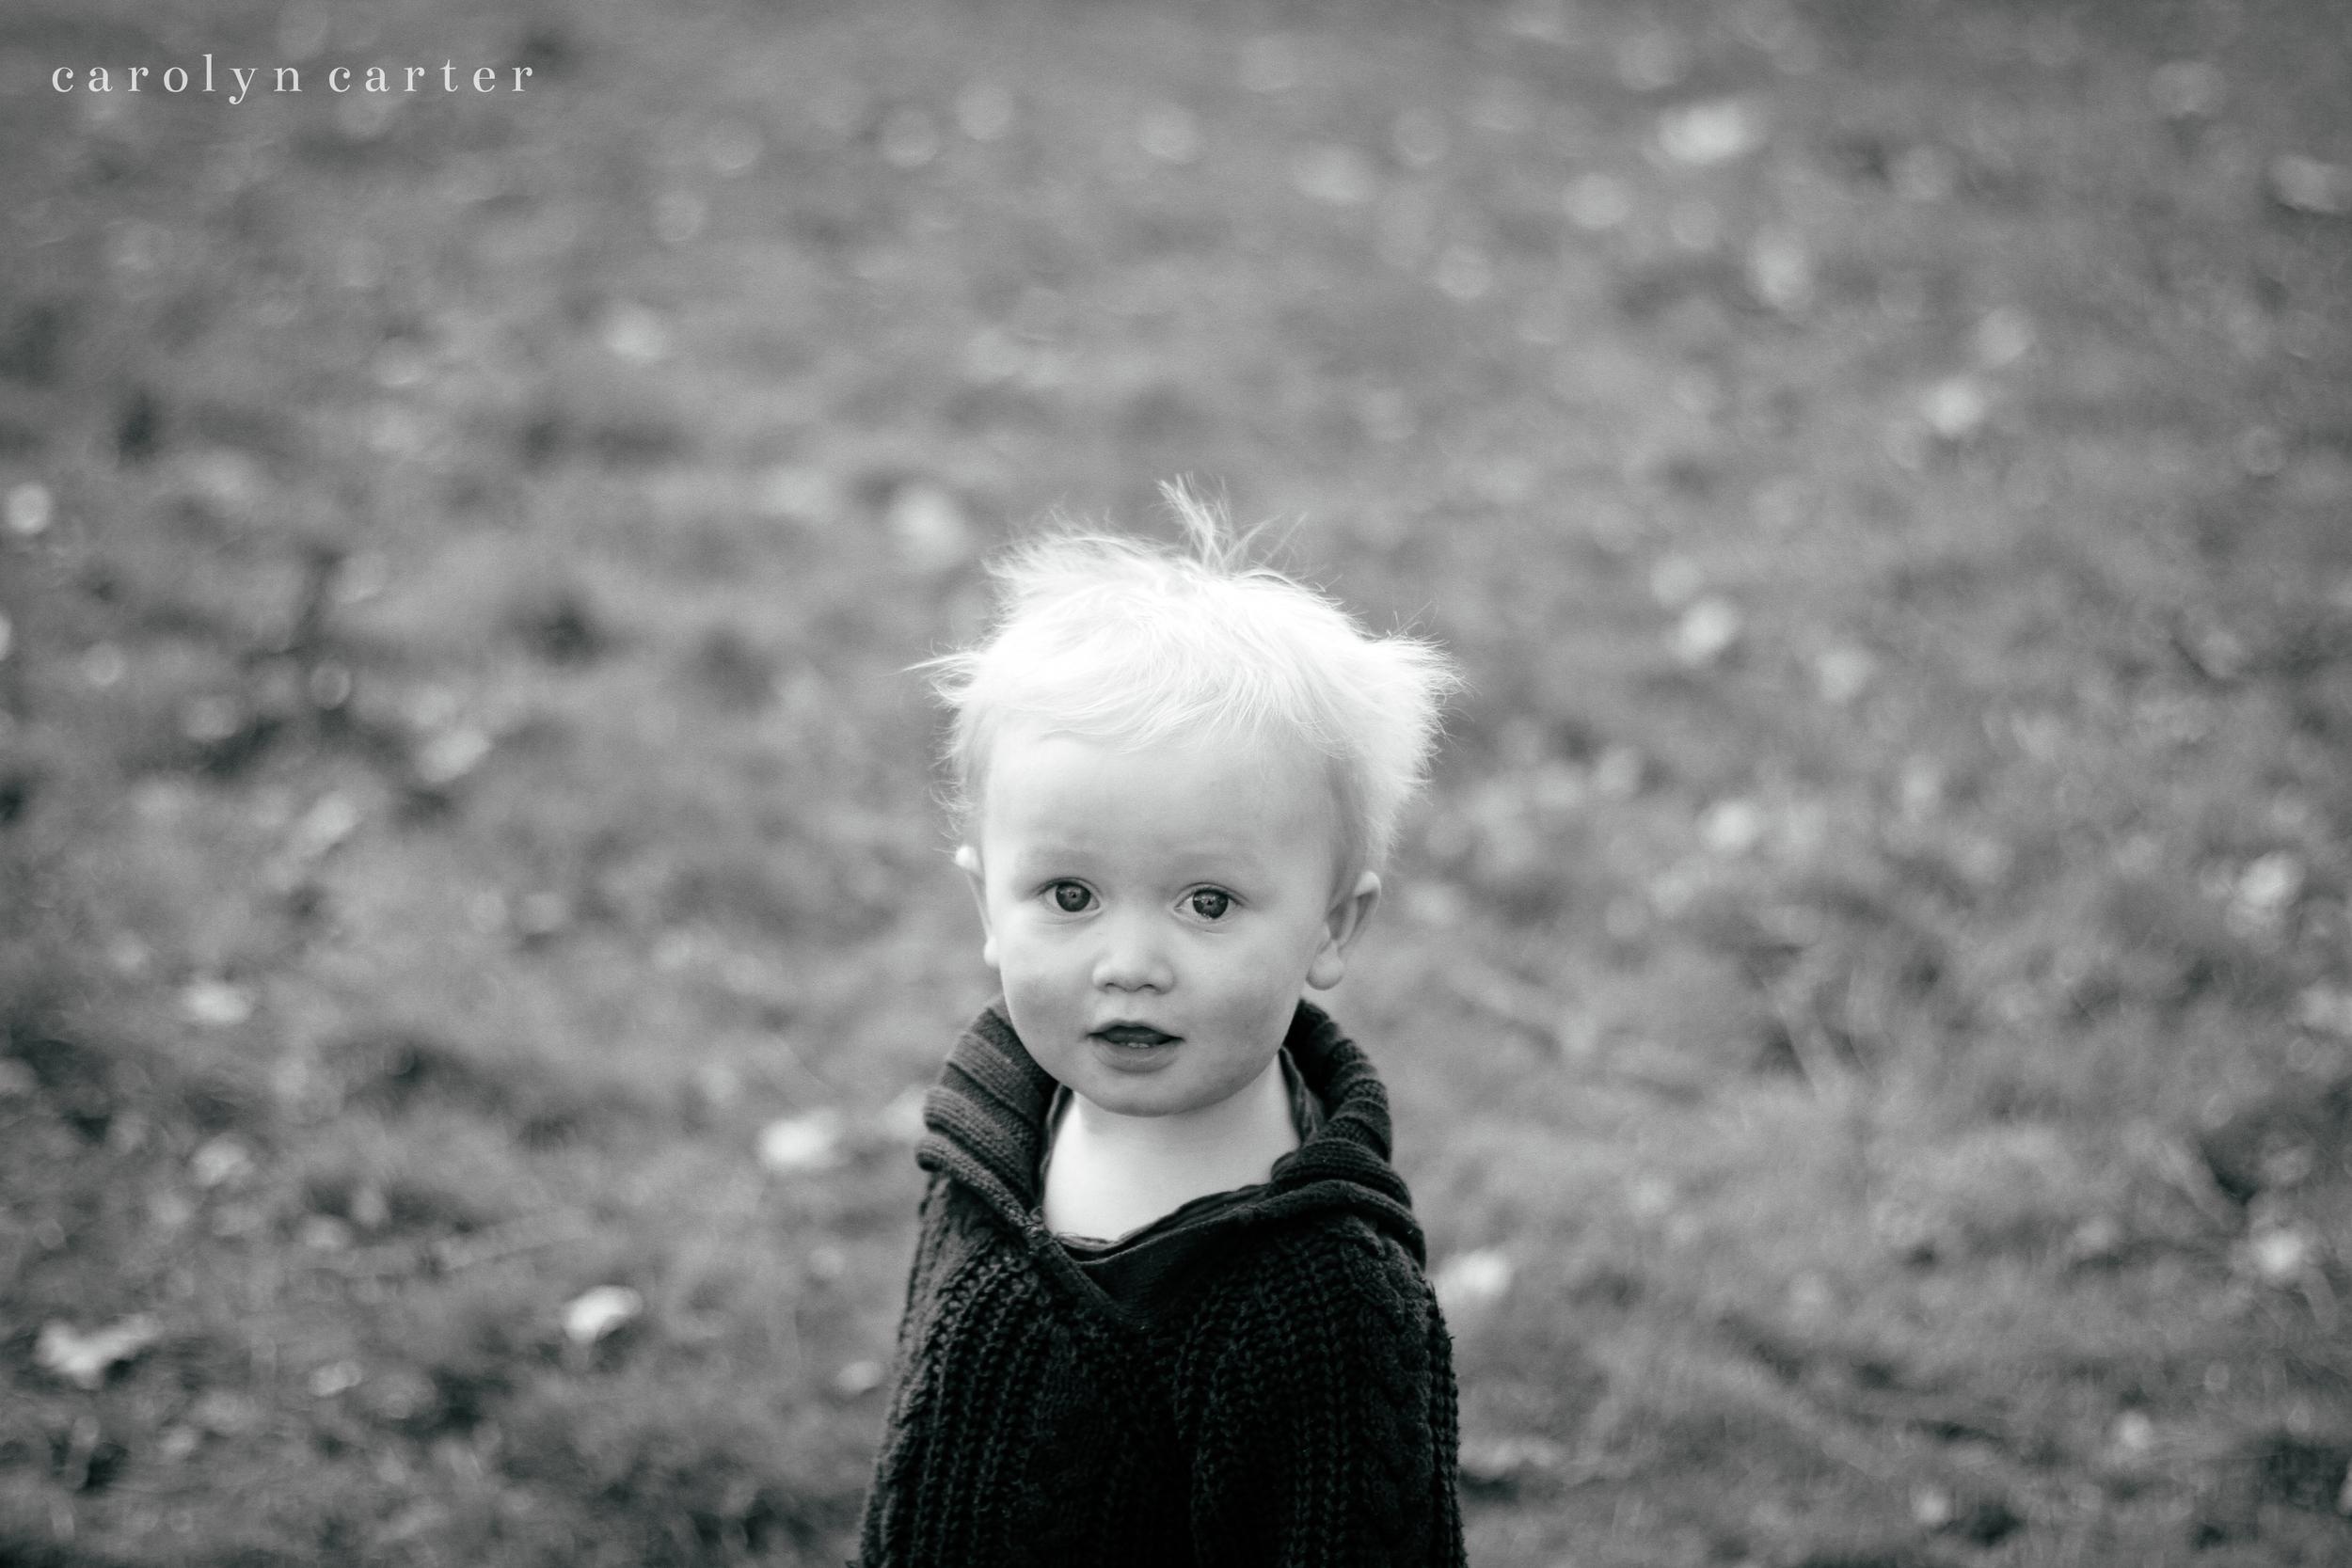 family portraits - carolyn carter